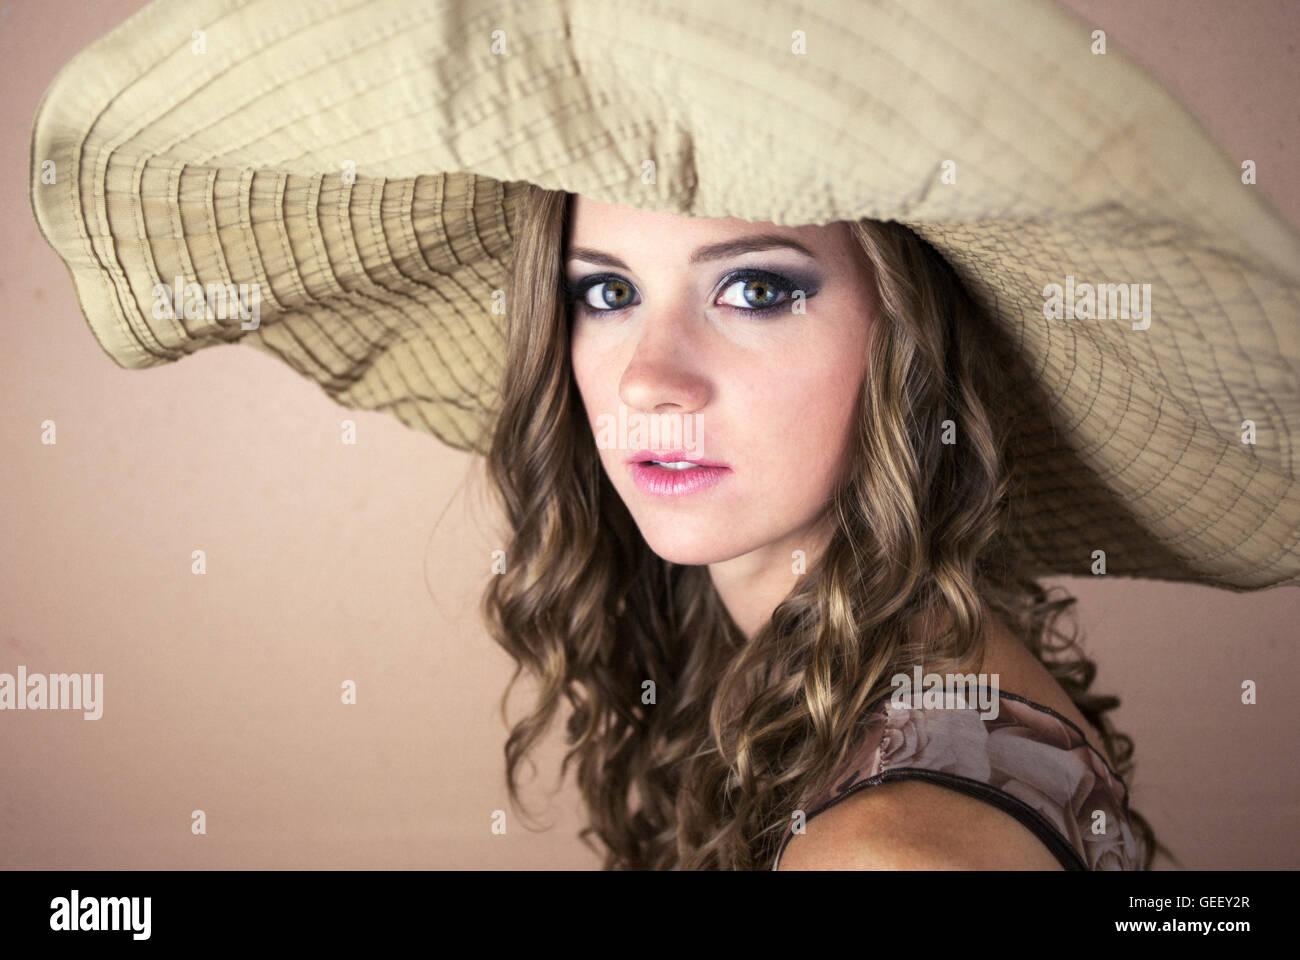 Schöne junge Frau, die große Sonne Hut Stockfoto